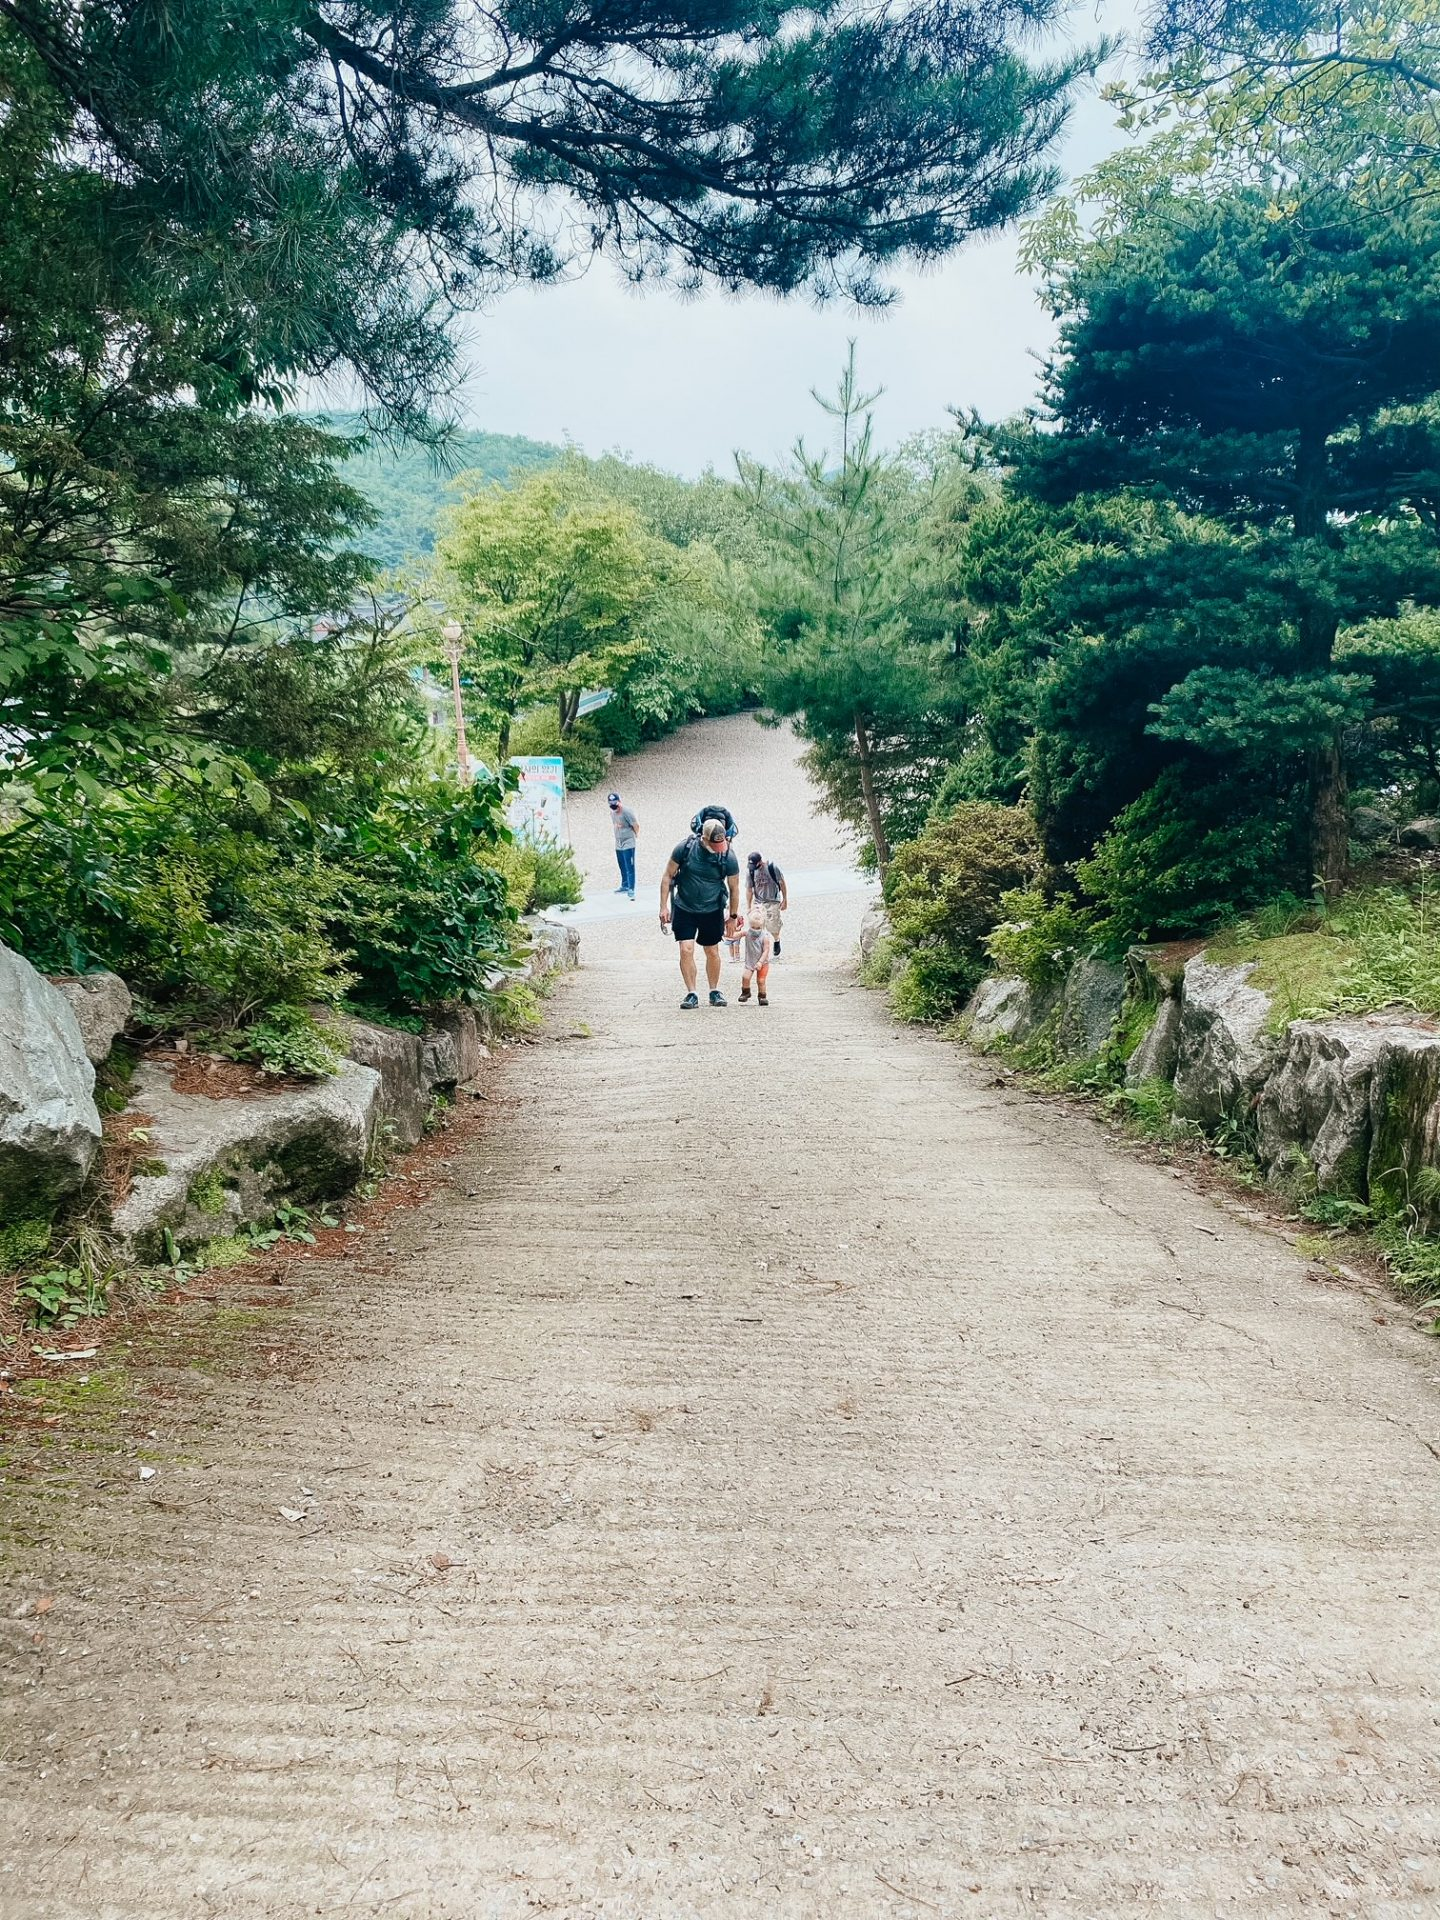 hiking gakwonsa temple